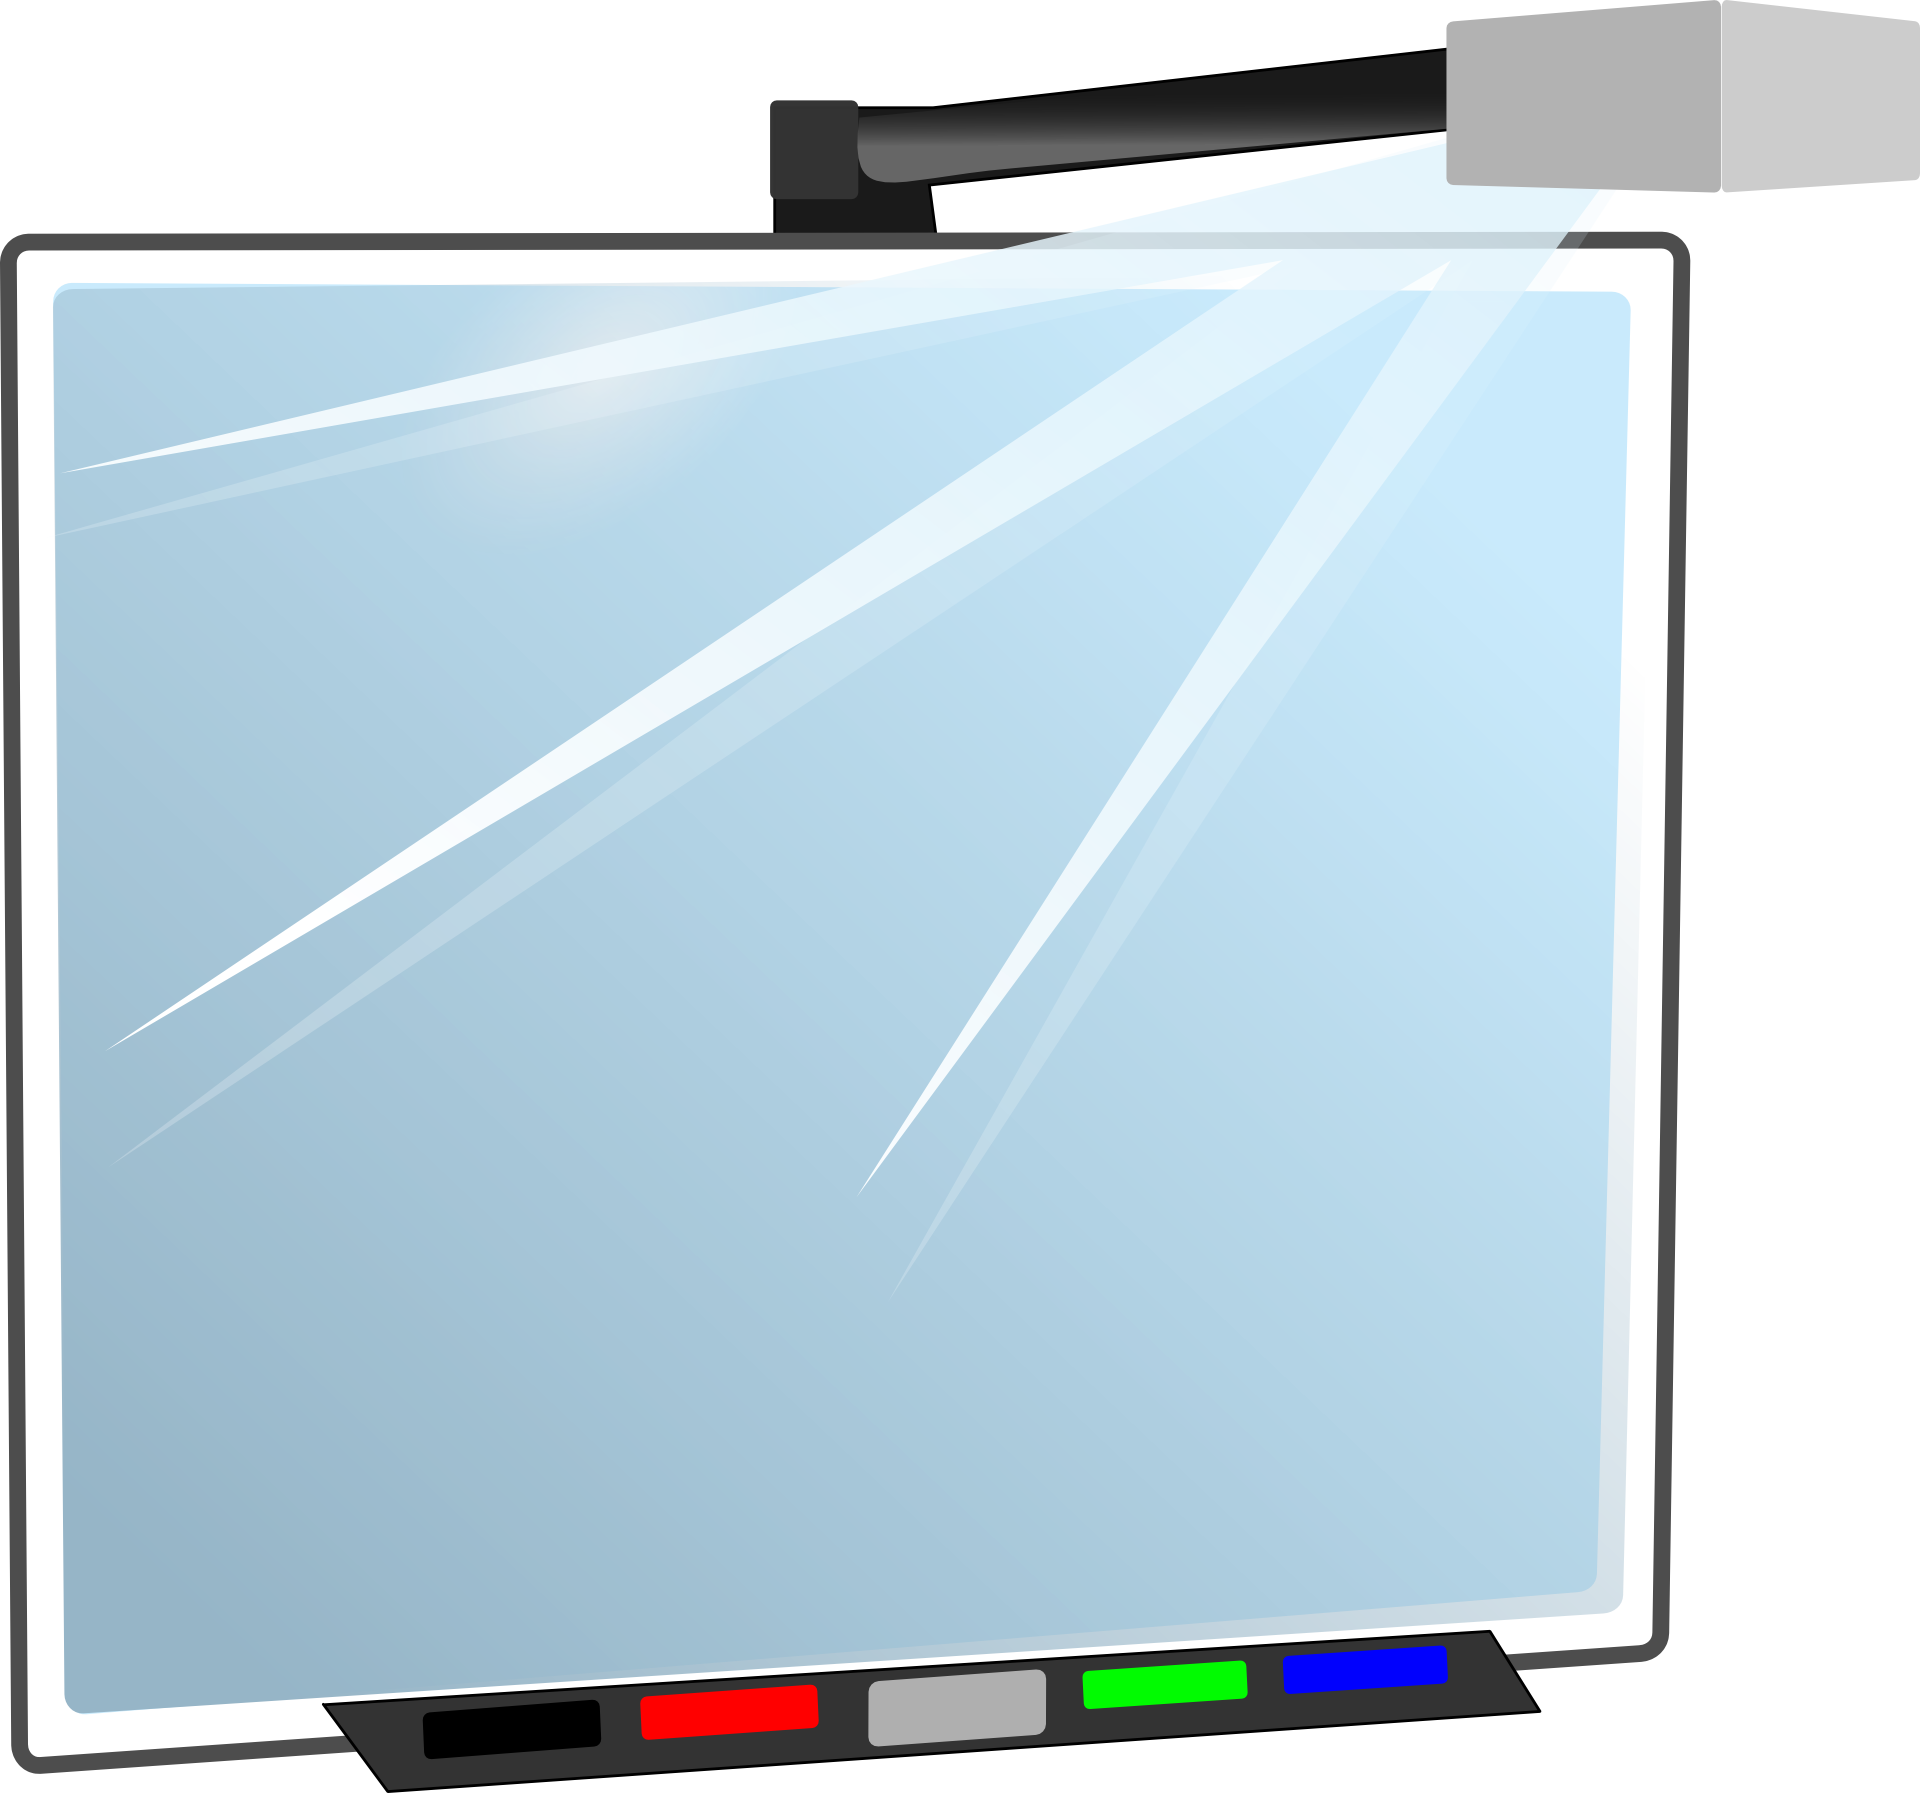 smartboard clipart transparent - 860×800